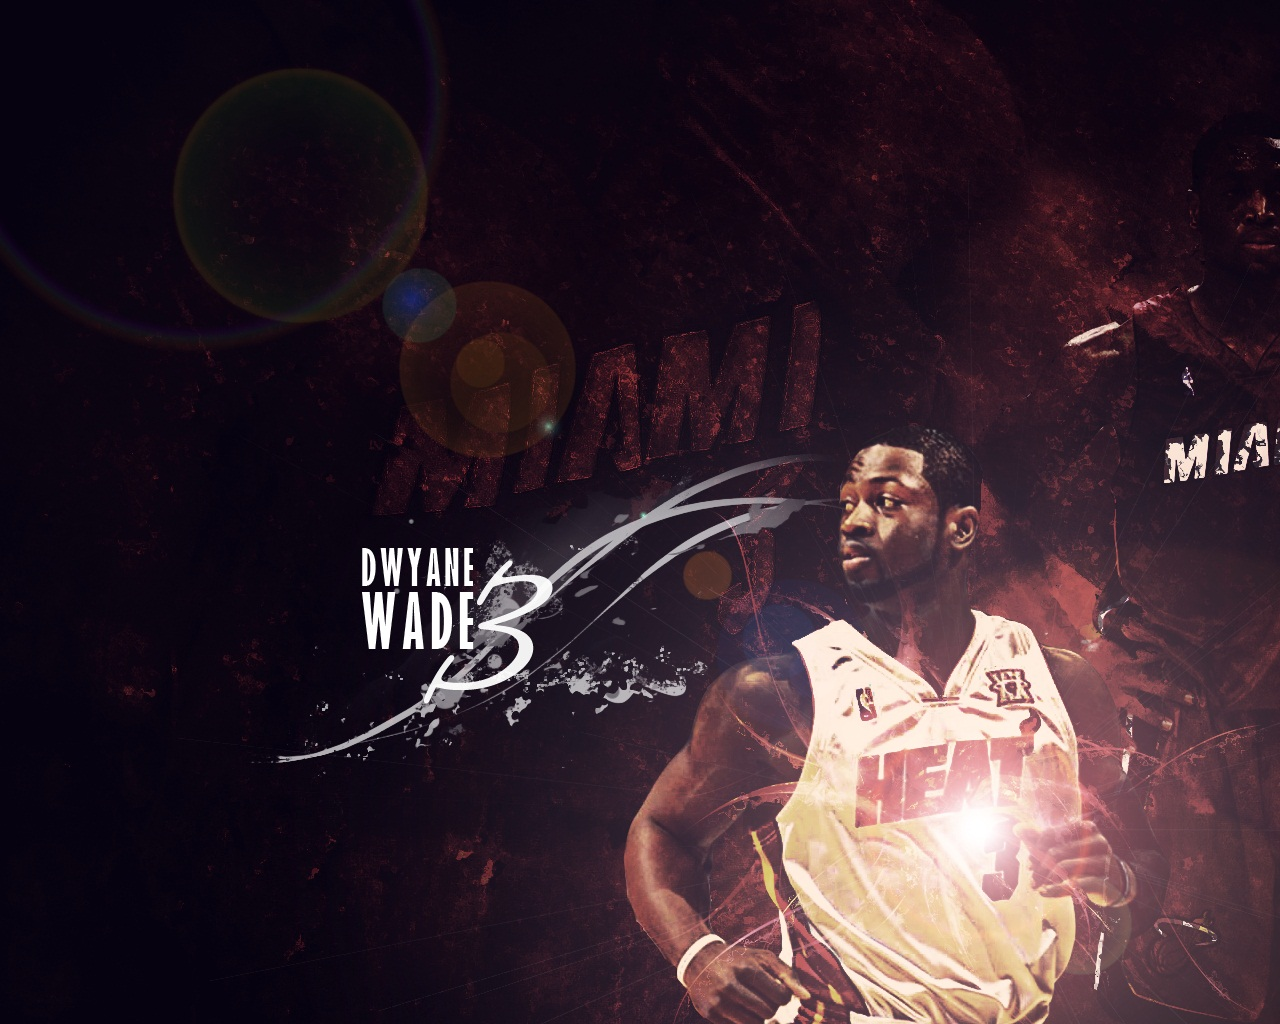 http://3.bp.blogspot.com/-Td88US8Lku4/TzuZj5Z3VAI/AAAAAAAAAiI/PPiTXcXSPIE/s1600/justplaybasketball-wallpapers-dwyane-wade-wallpapers.jpg